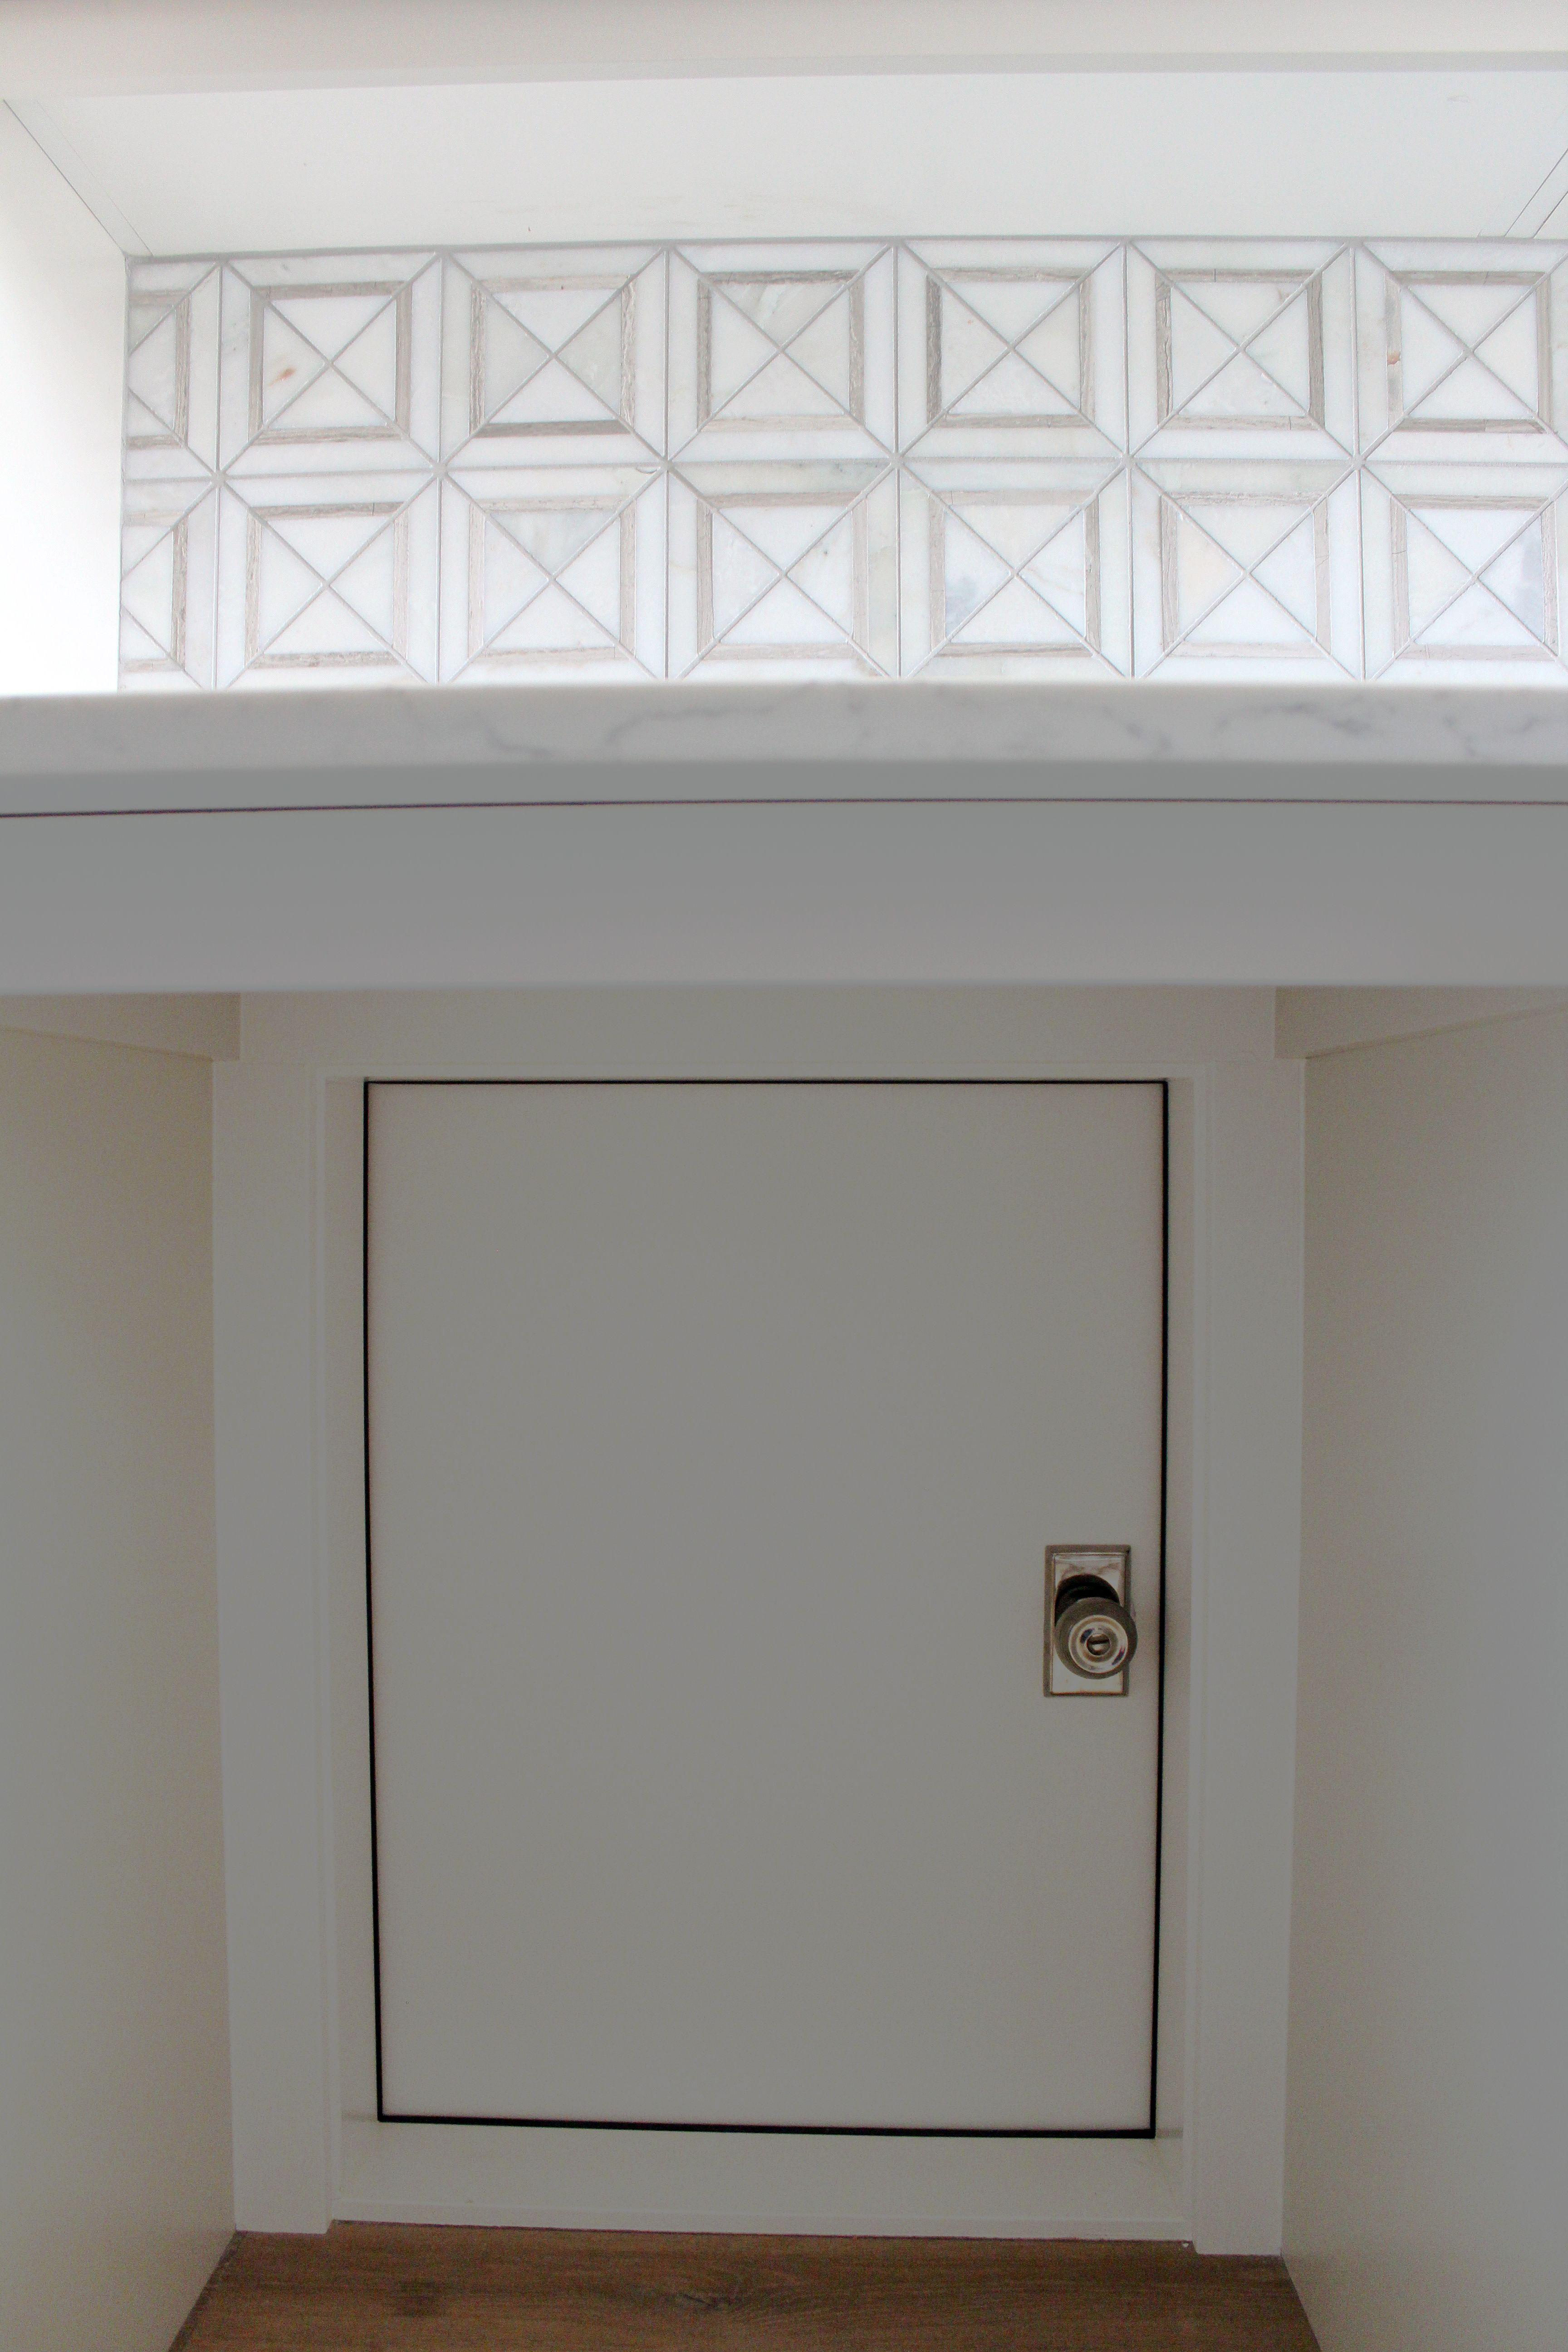 The Smi Inland Coastal Pantry Reveal Sita Montgomery Interiors Costco Door Building A New Home New Homes Interior